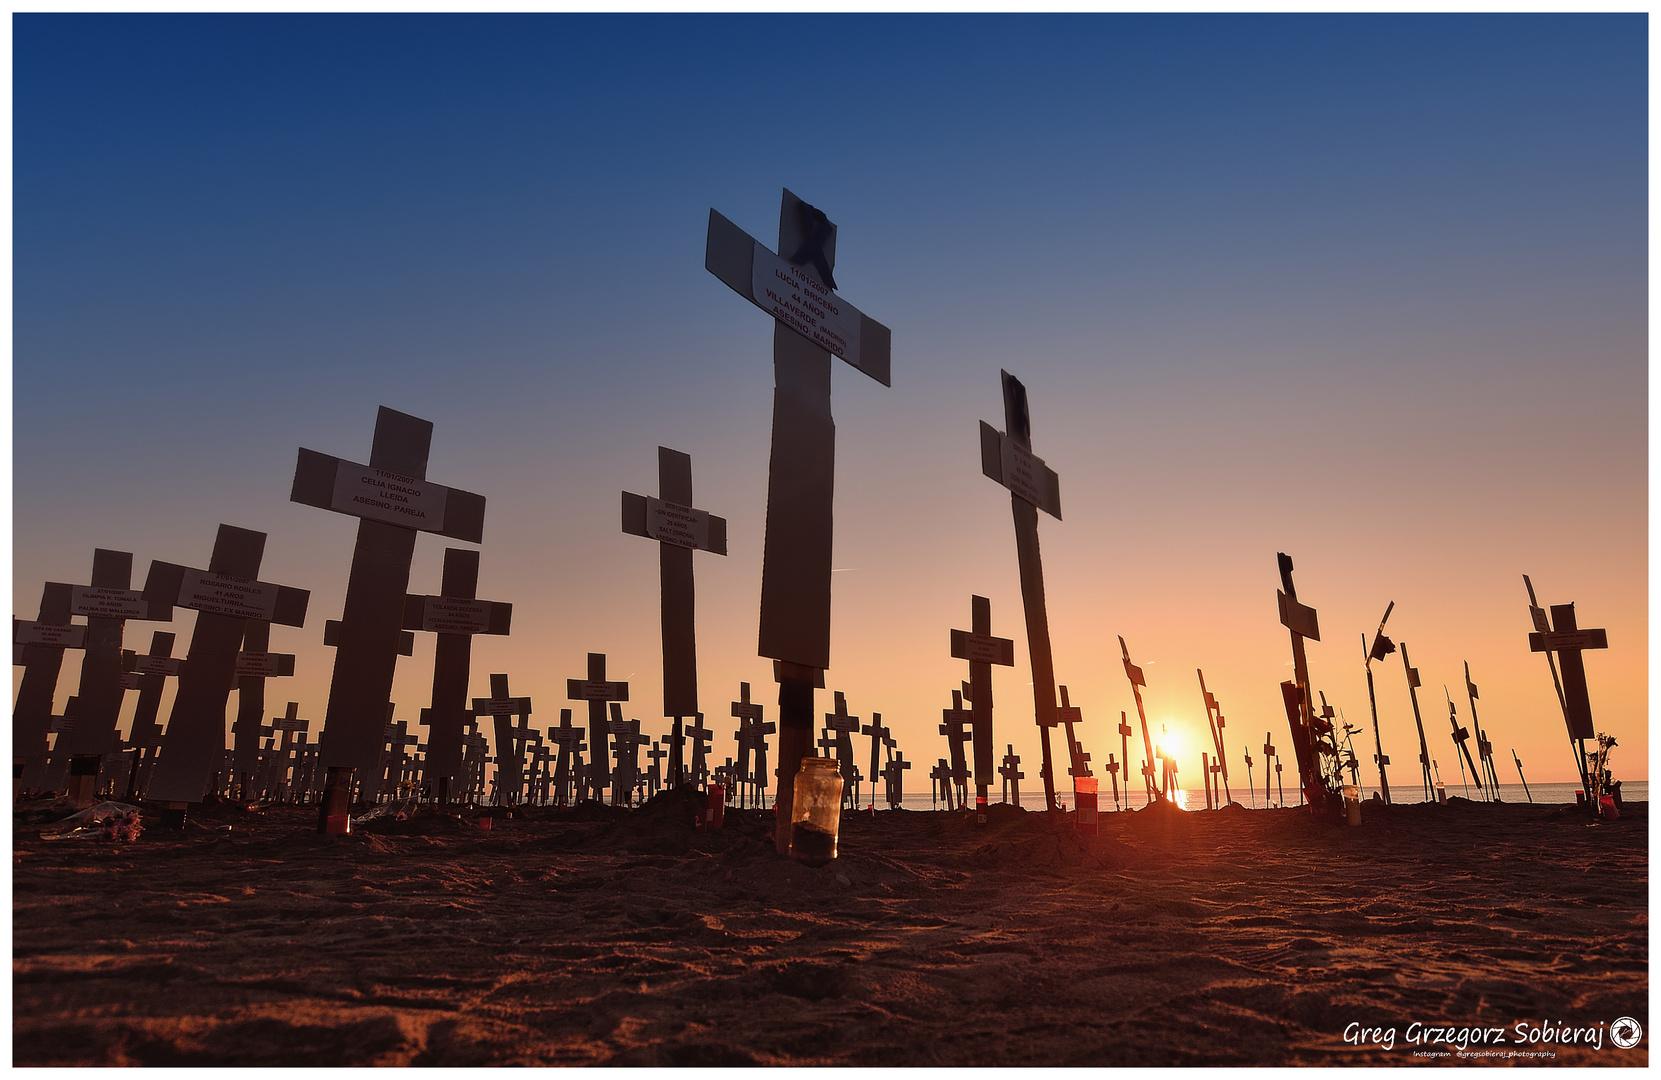 739  Crosses